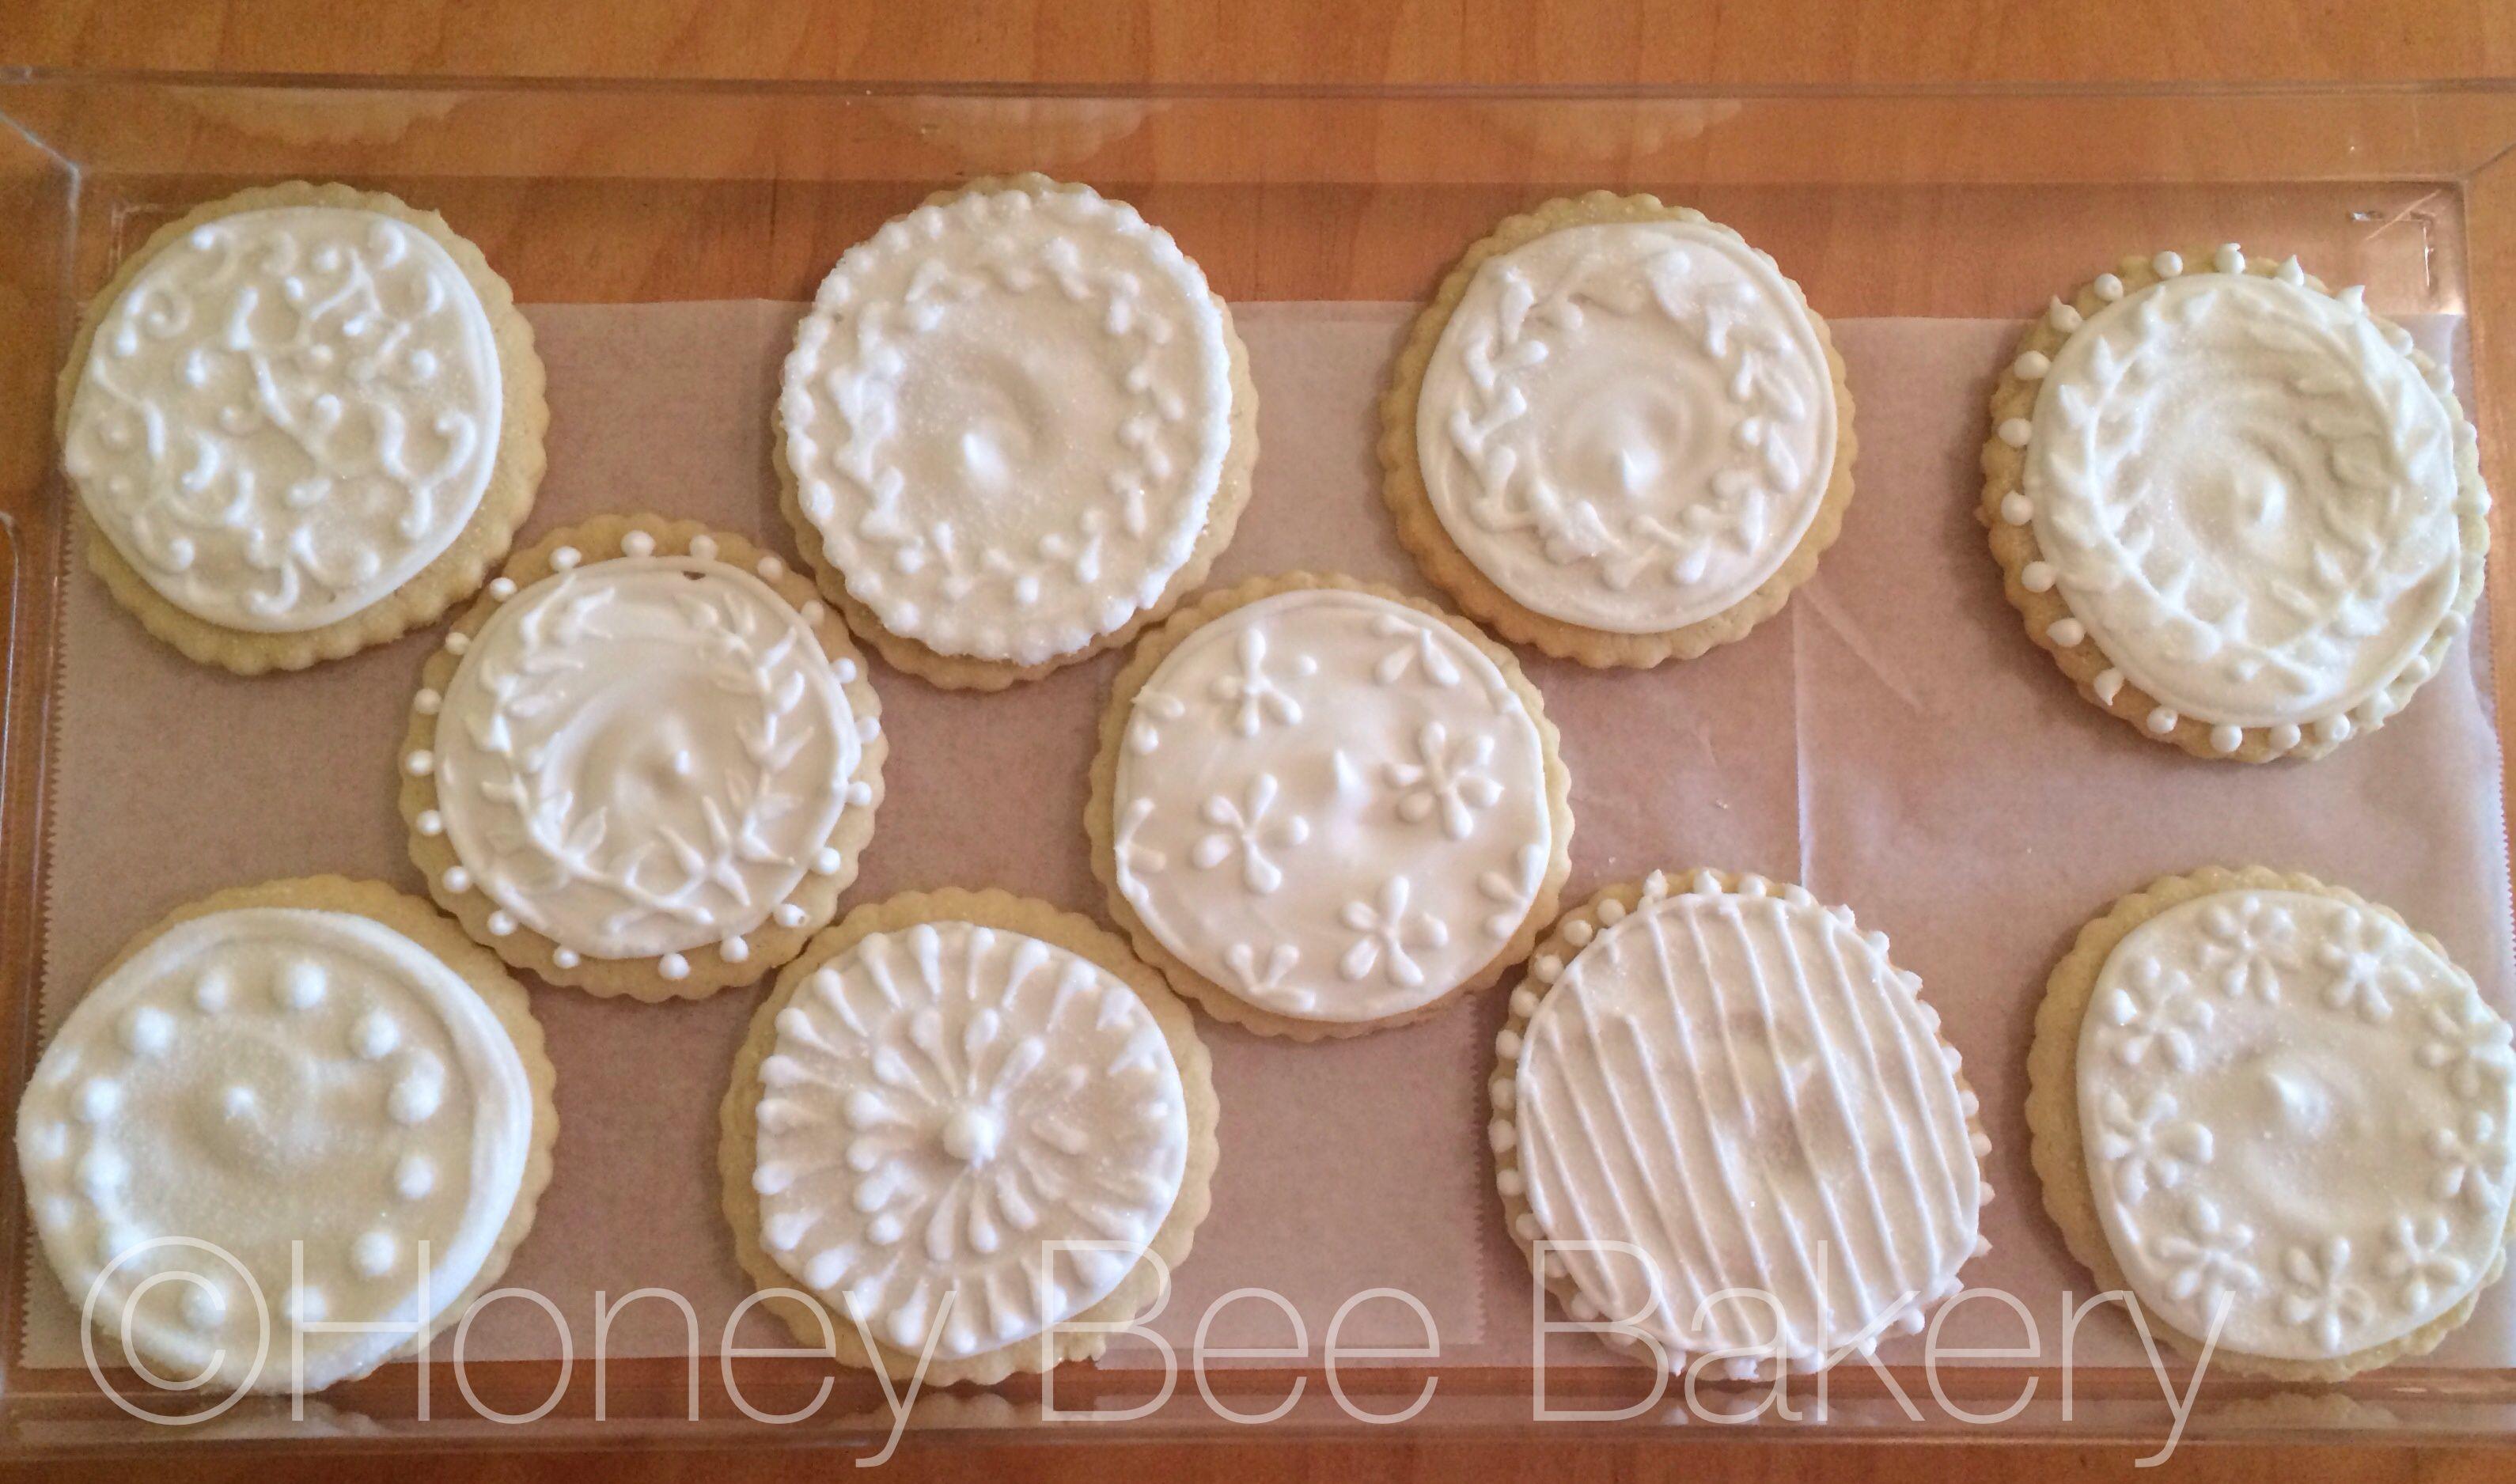 #whiteonwhite #icedsugarcookies #laurelwreath